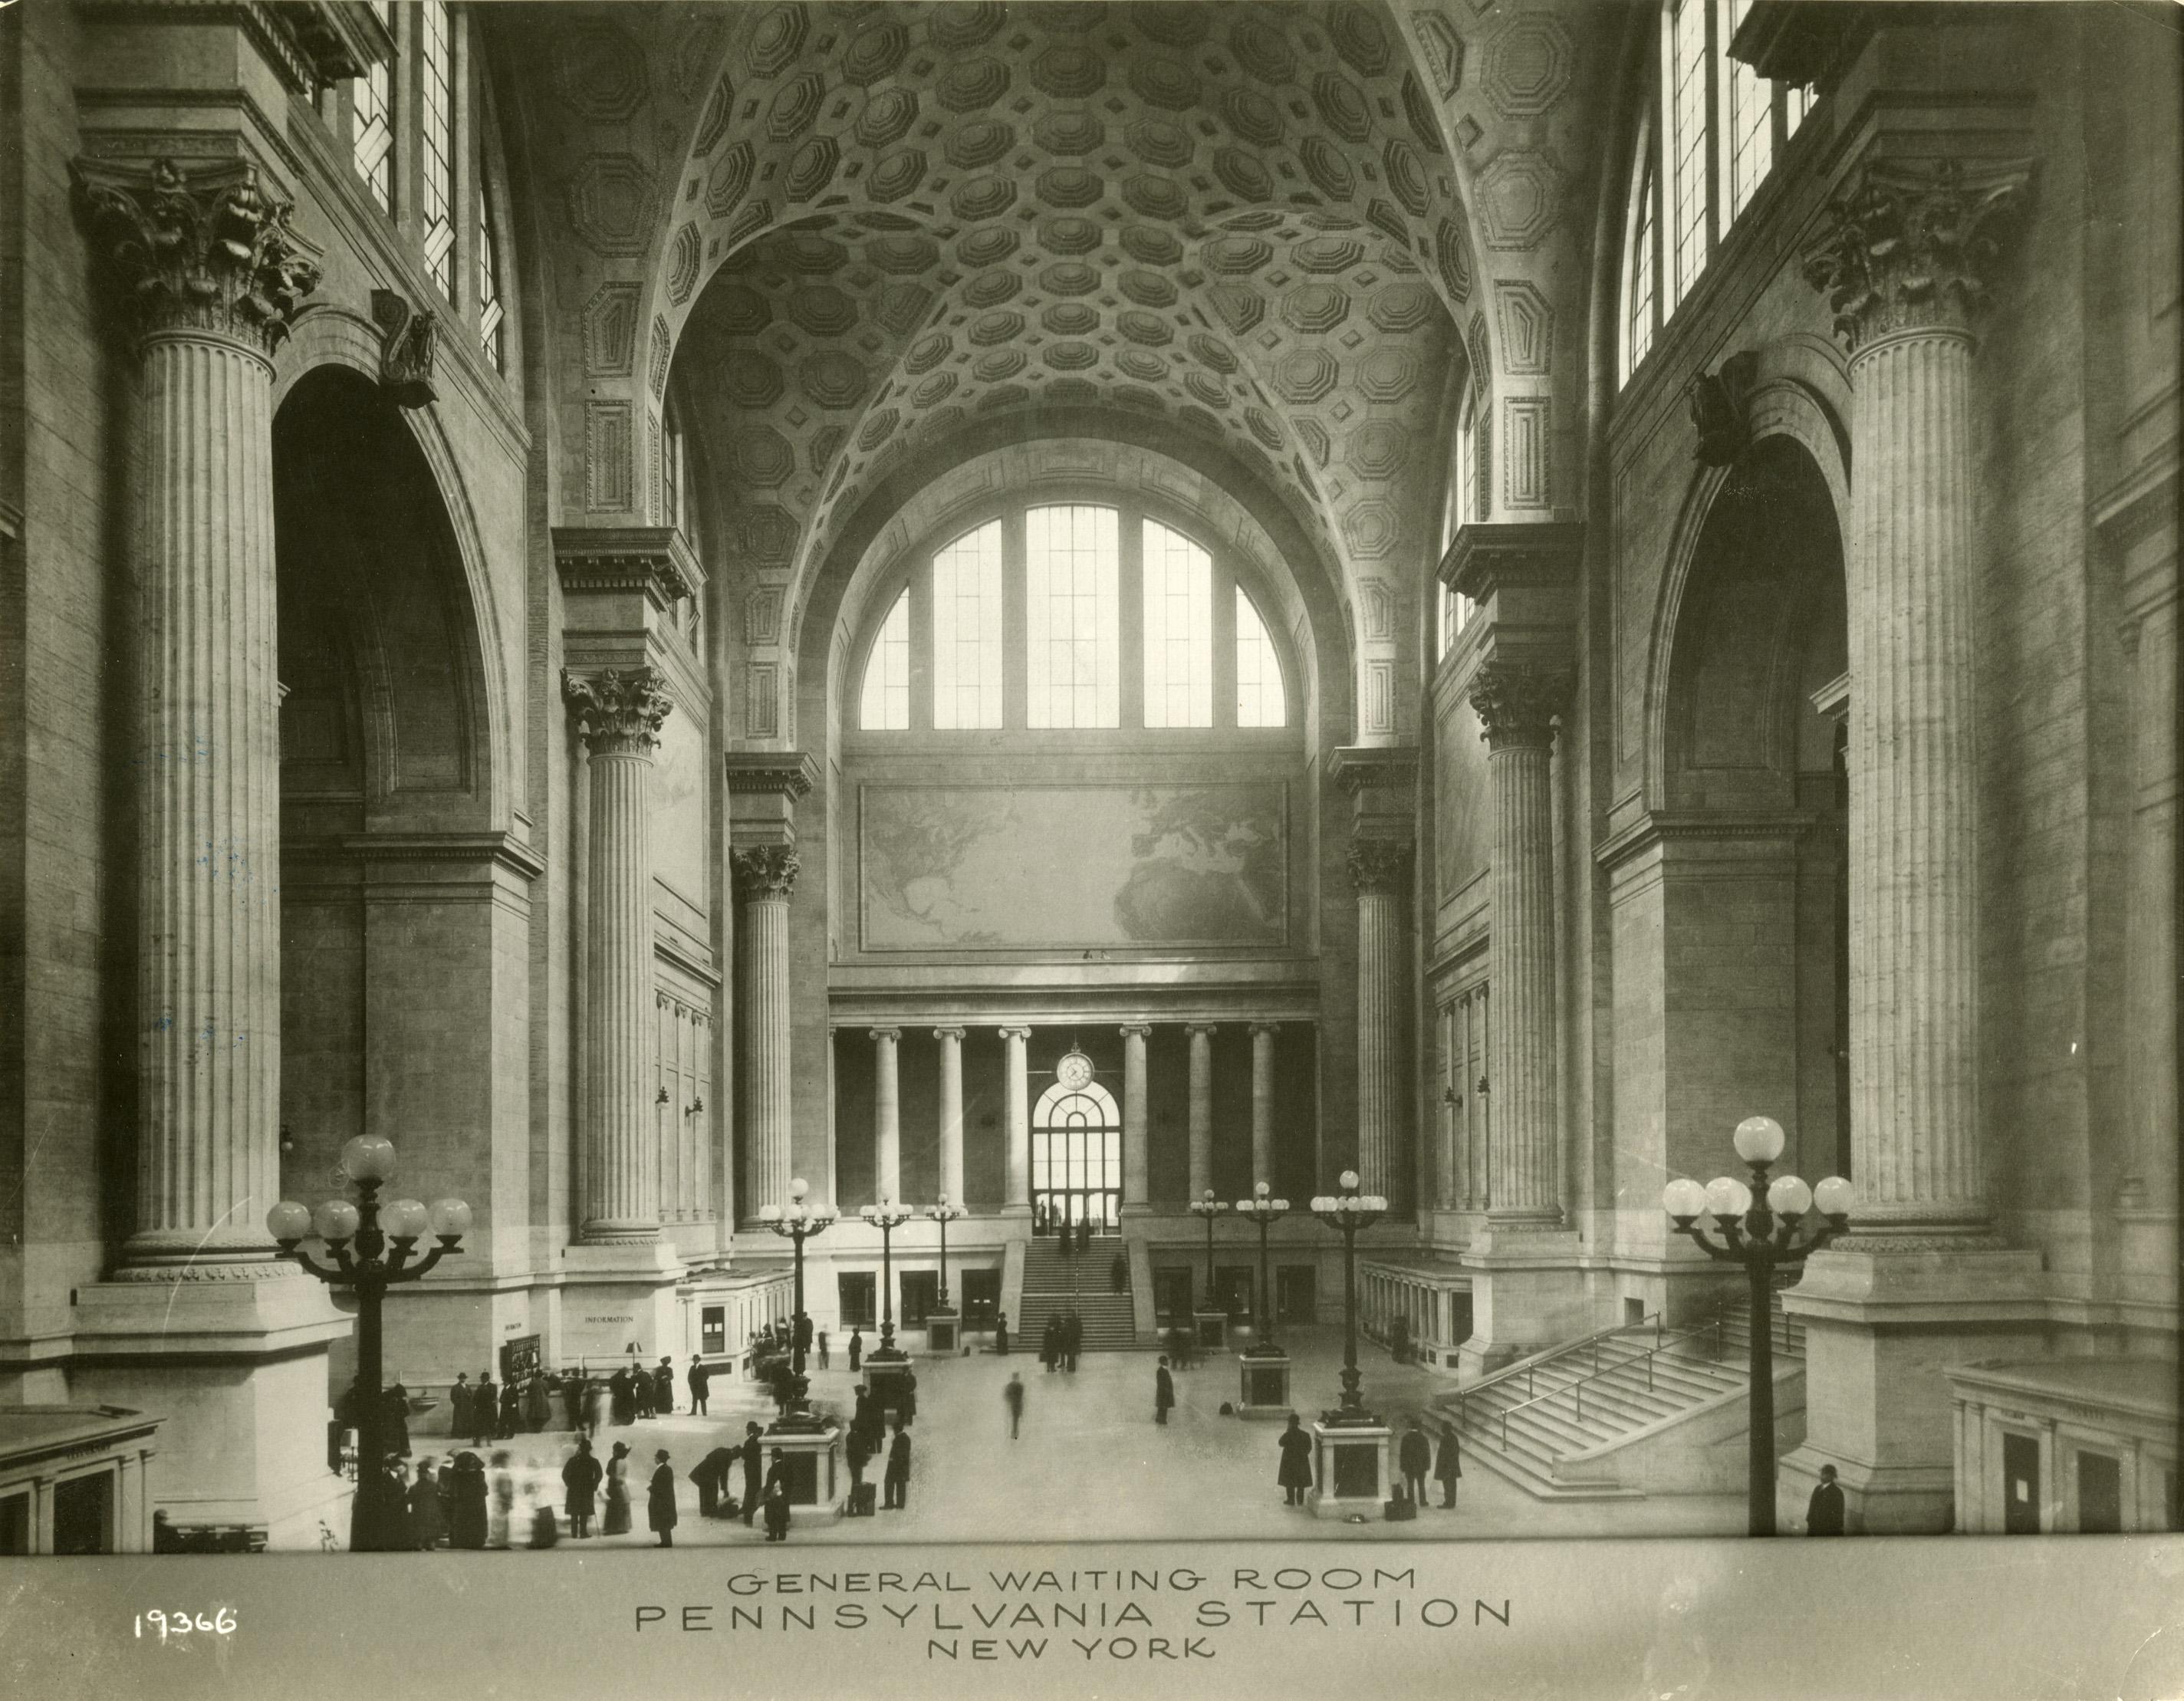 Penn Station Nyc Map Inside.Explorepahistory Com Image